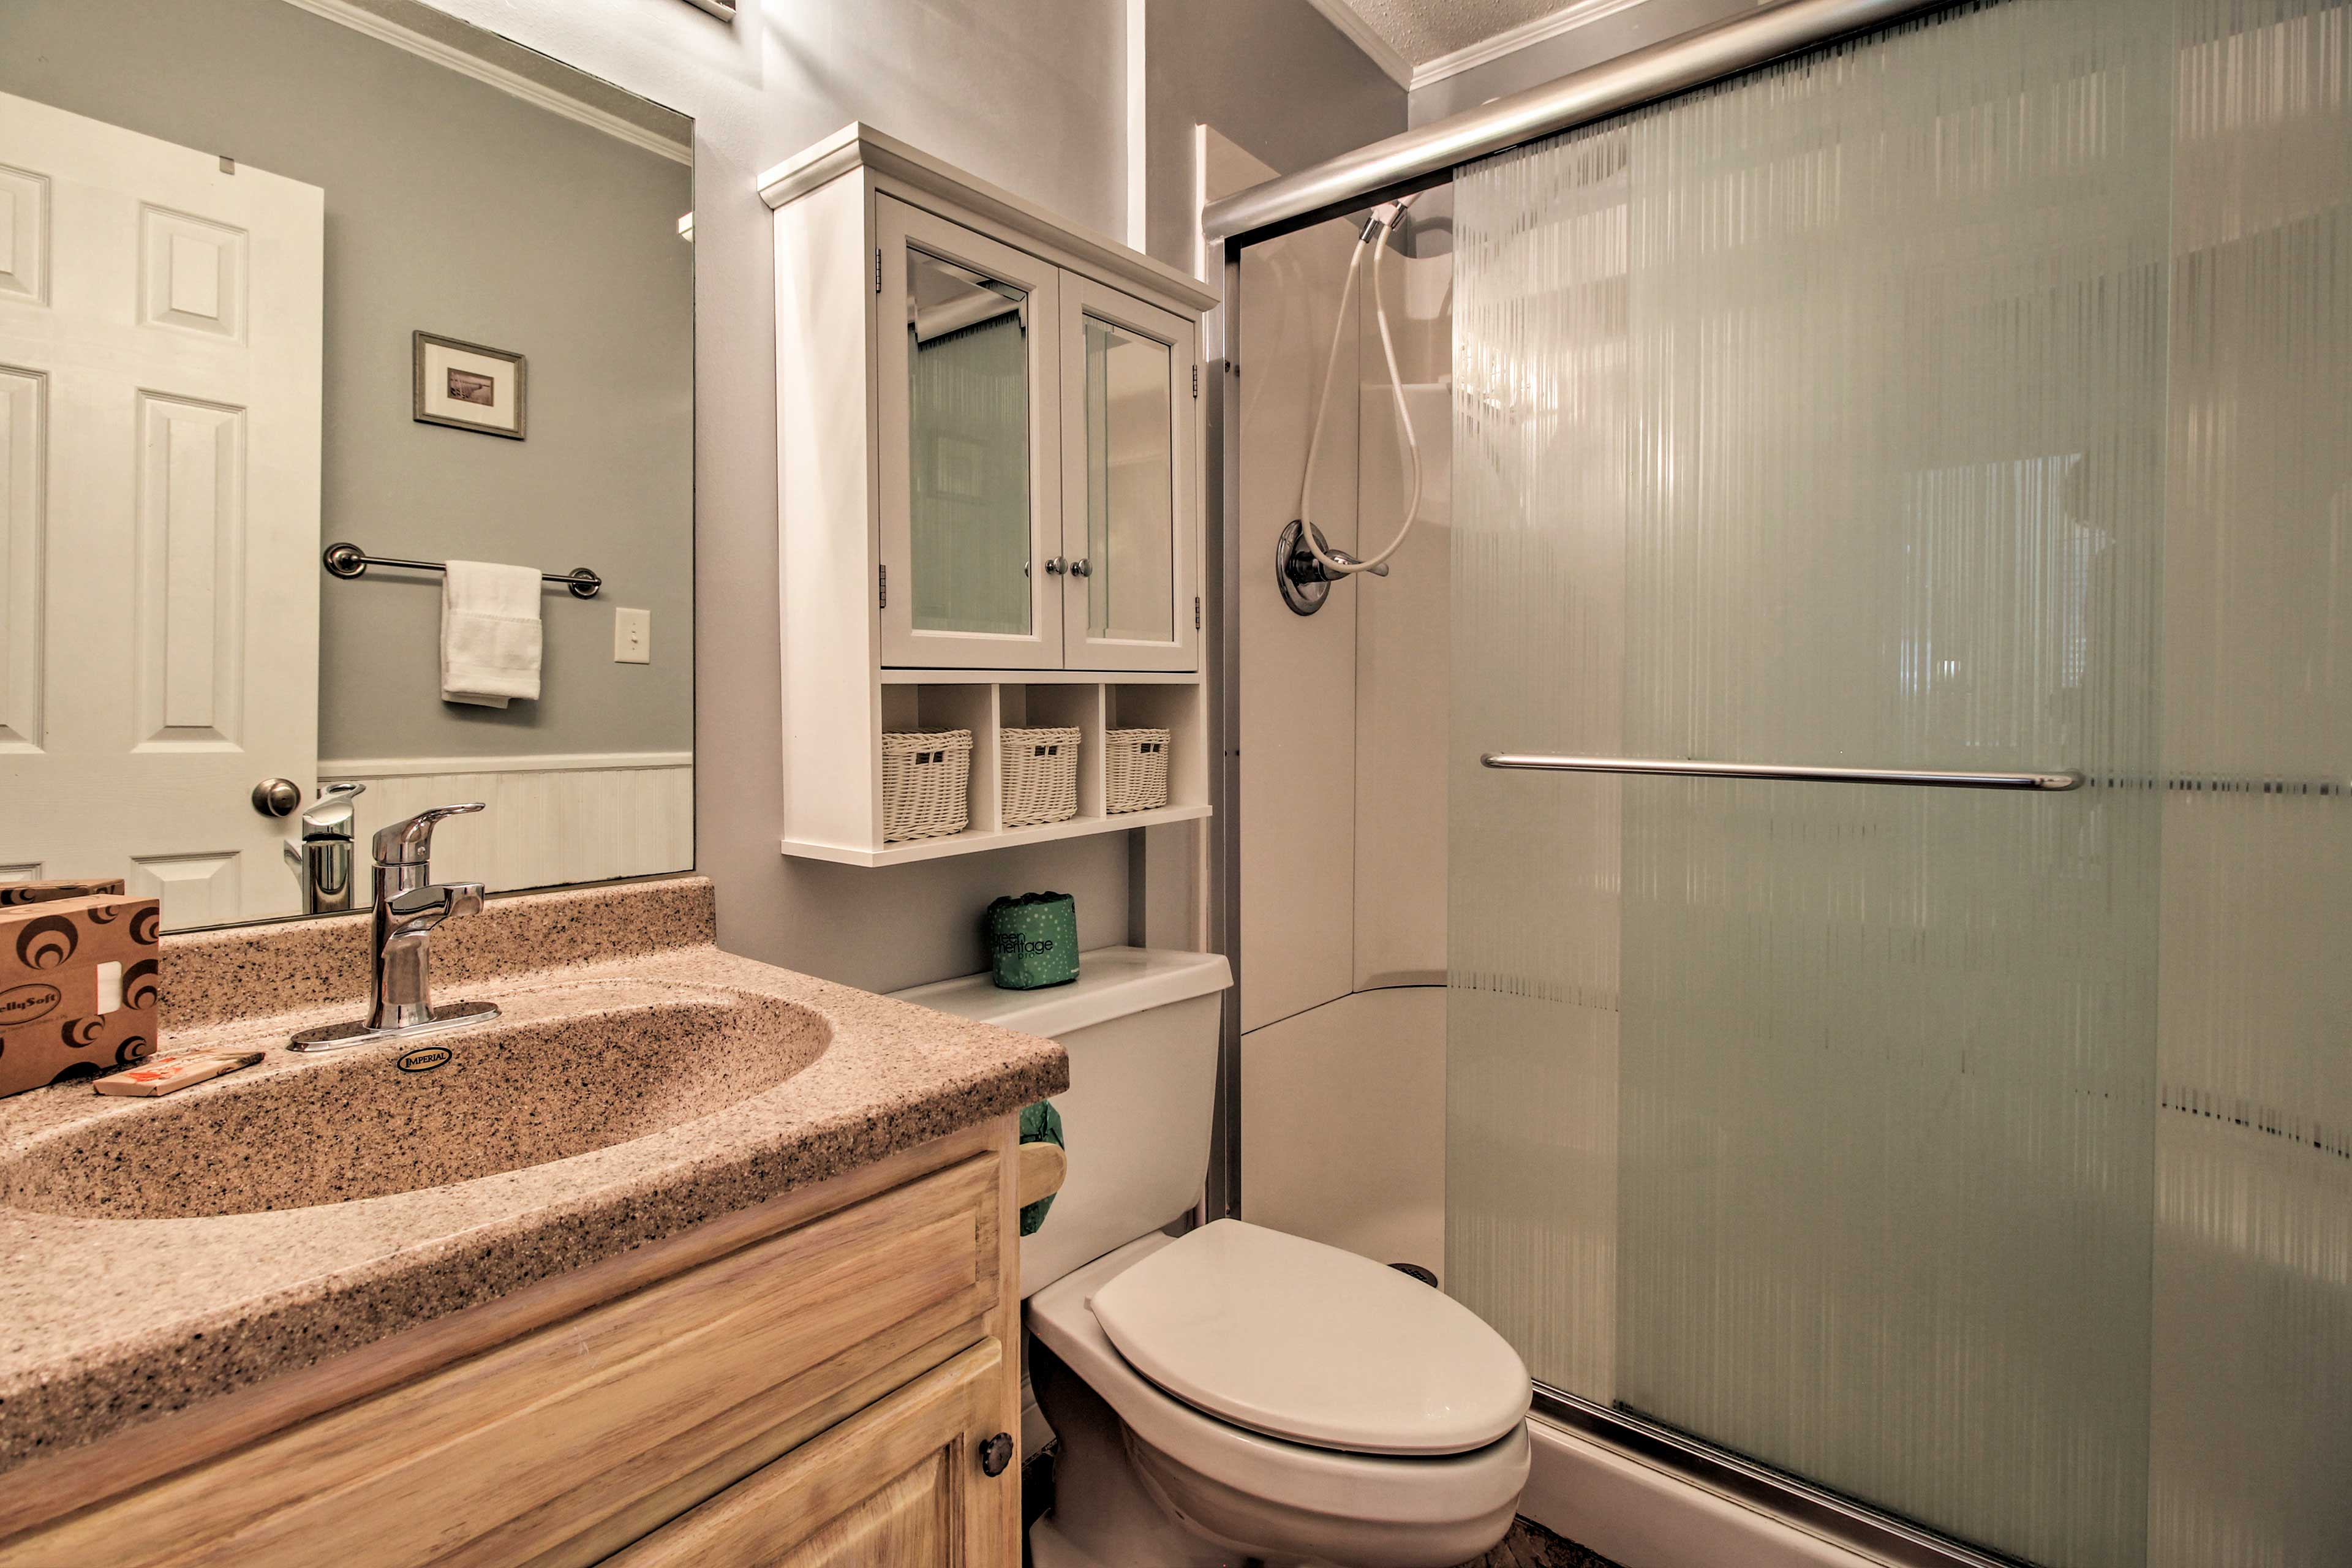 Full Bathroom   Shower Grab Rails   Towels Provided